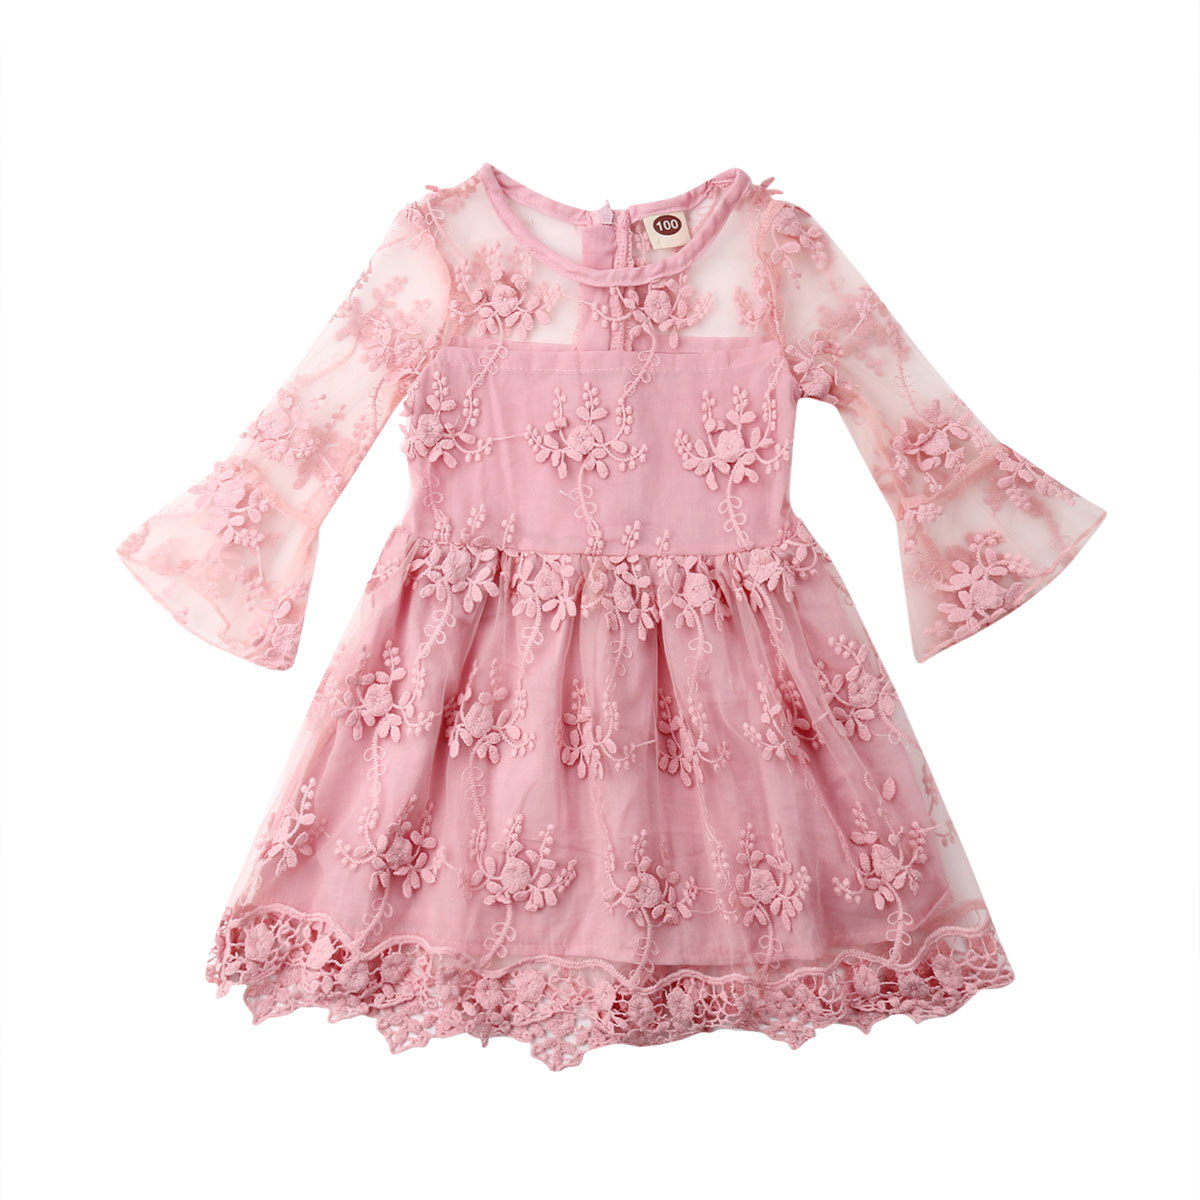 ZARA Girls MAUVE DOTTY Embroidered Graduated Blouse Peplum Top 4-14y £10.99